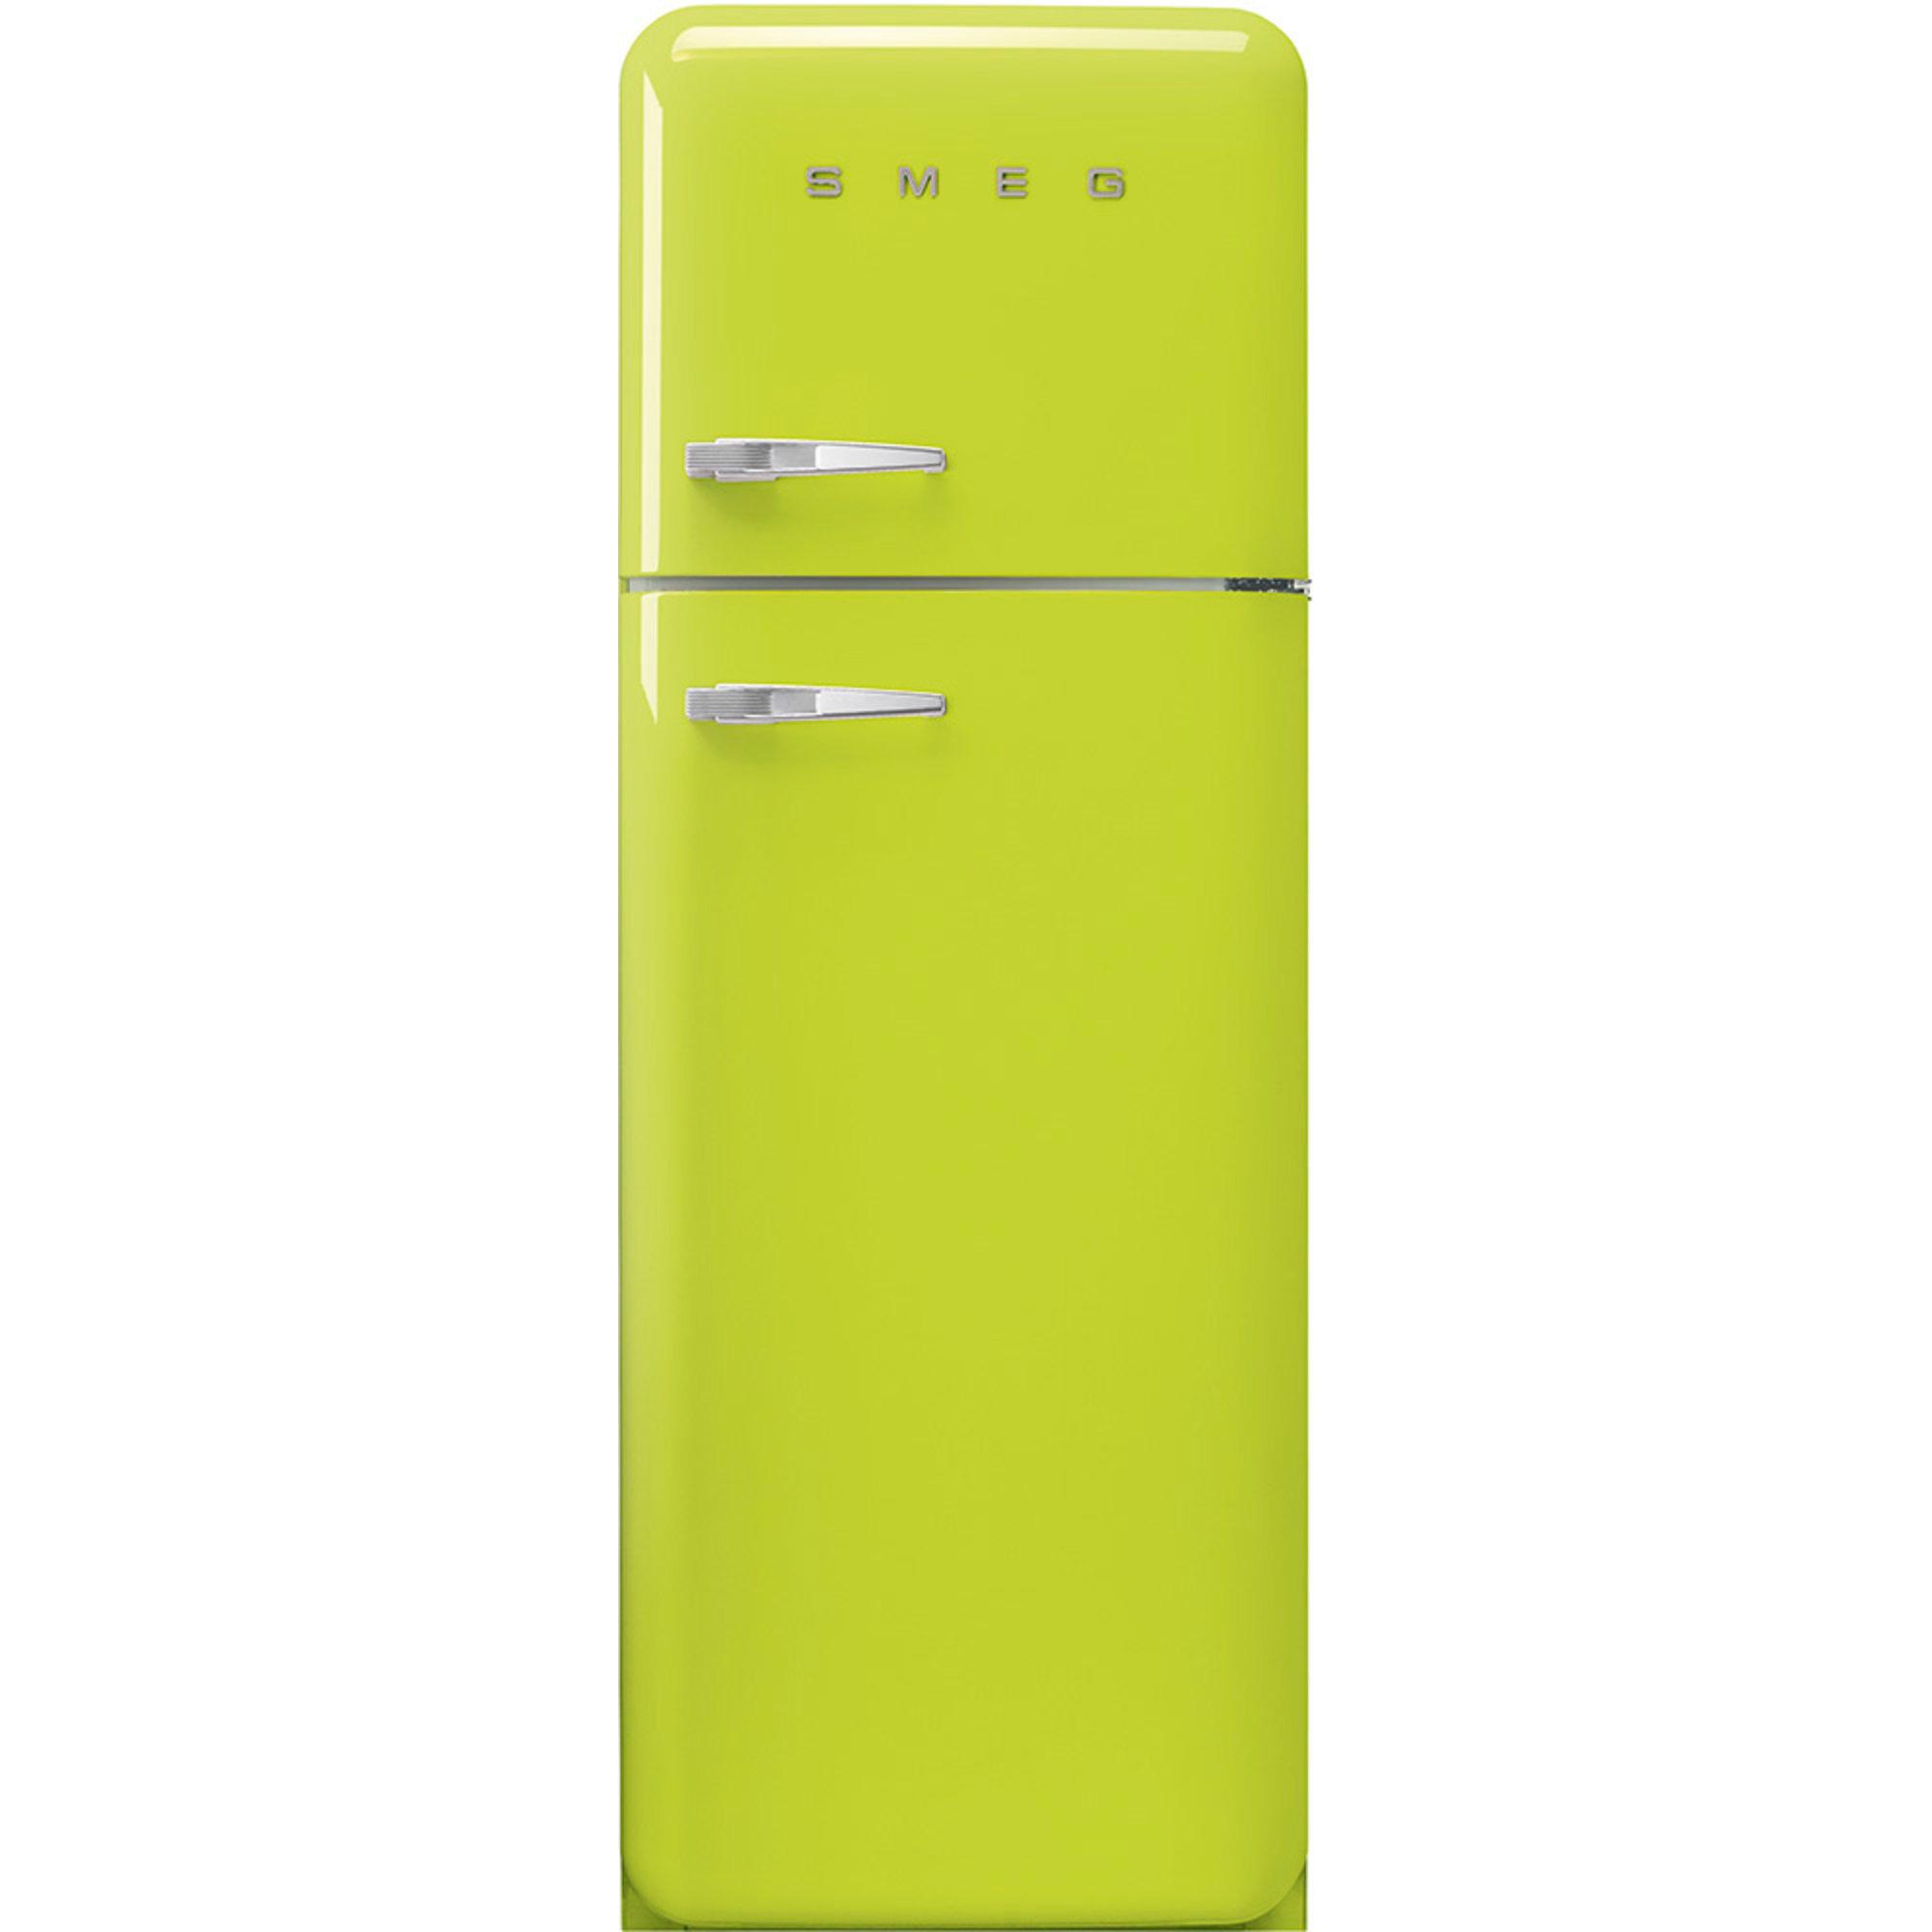 Smeg 172 cm Högerhängt kylskåp/frys i 50-tals Retro Design Limegrön